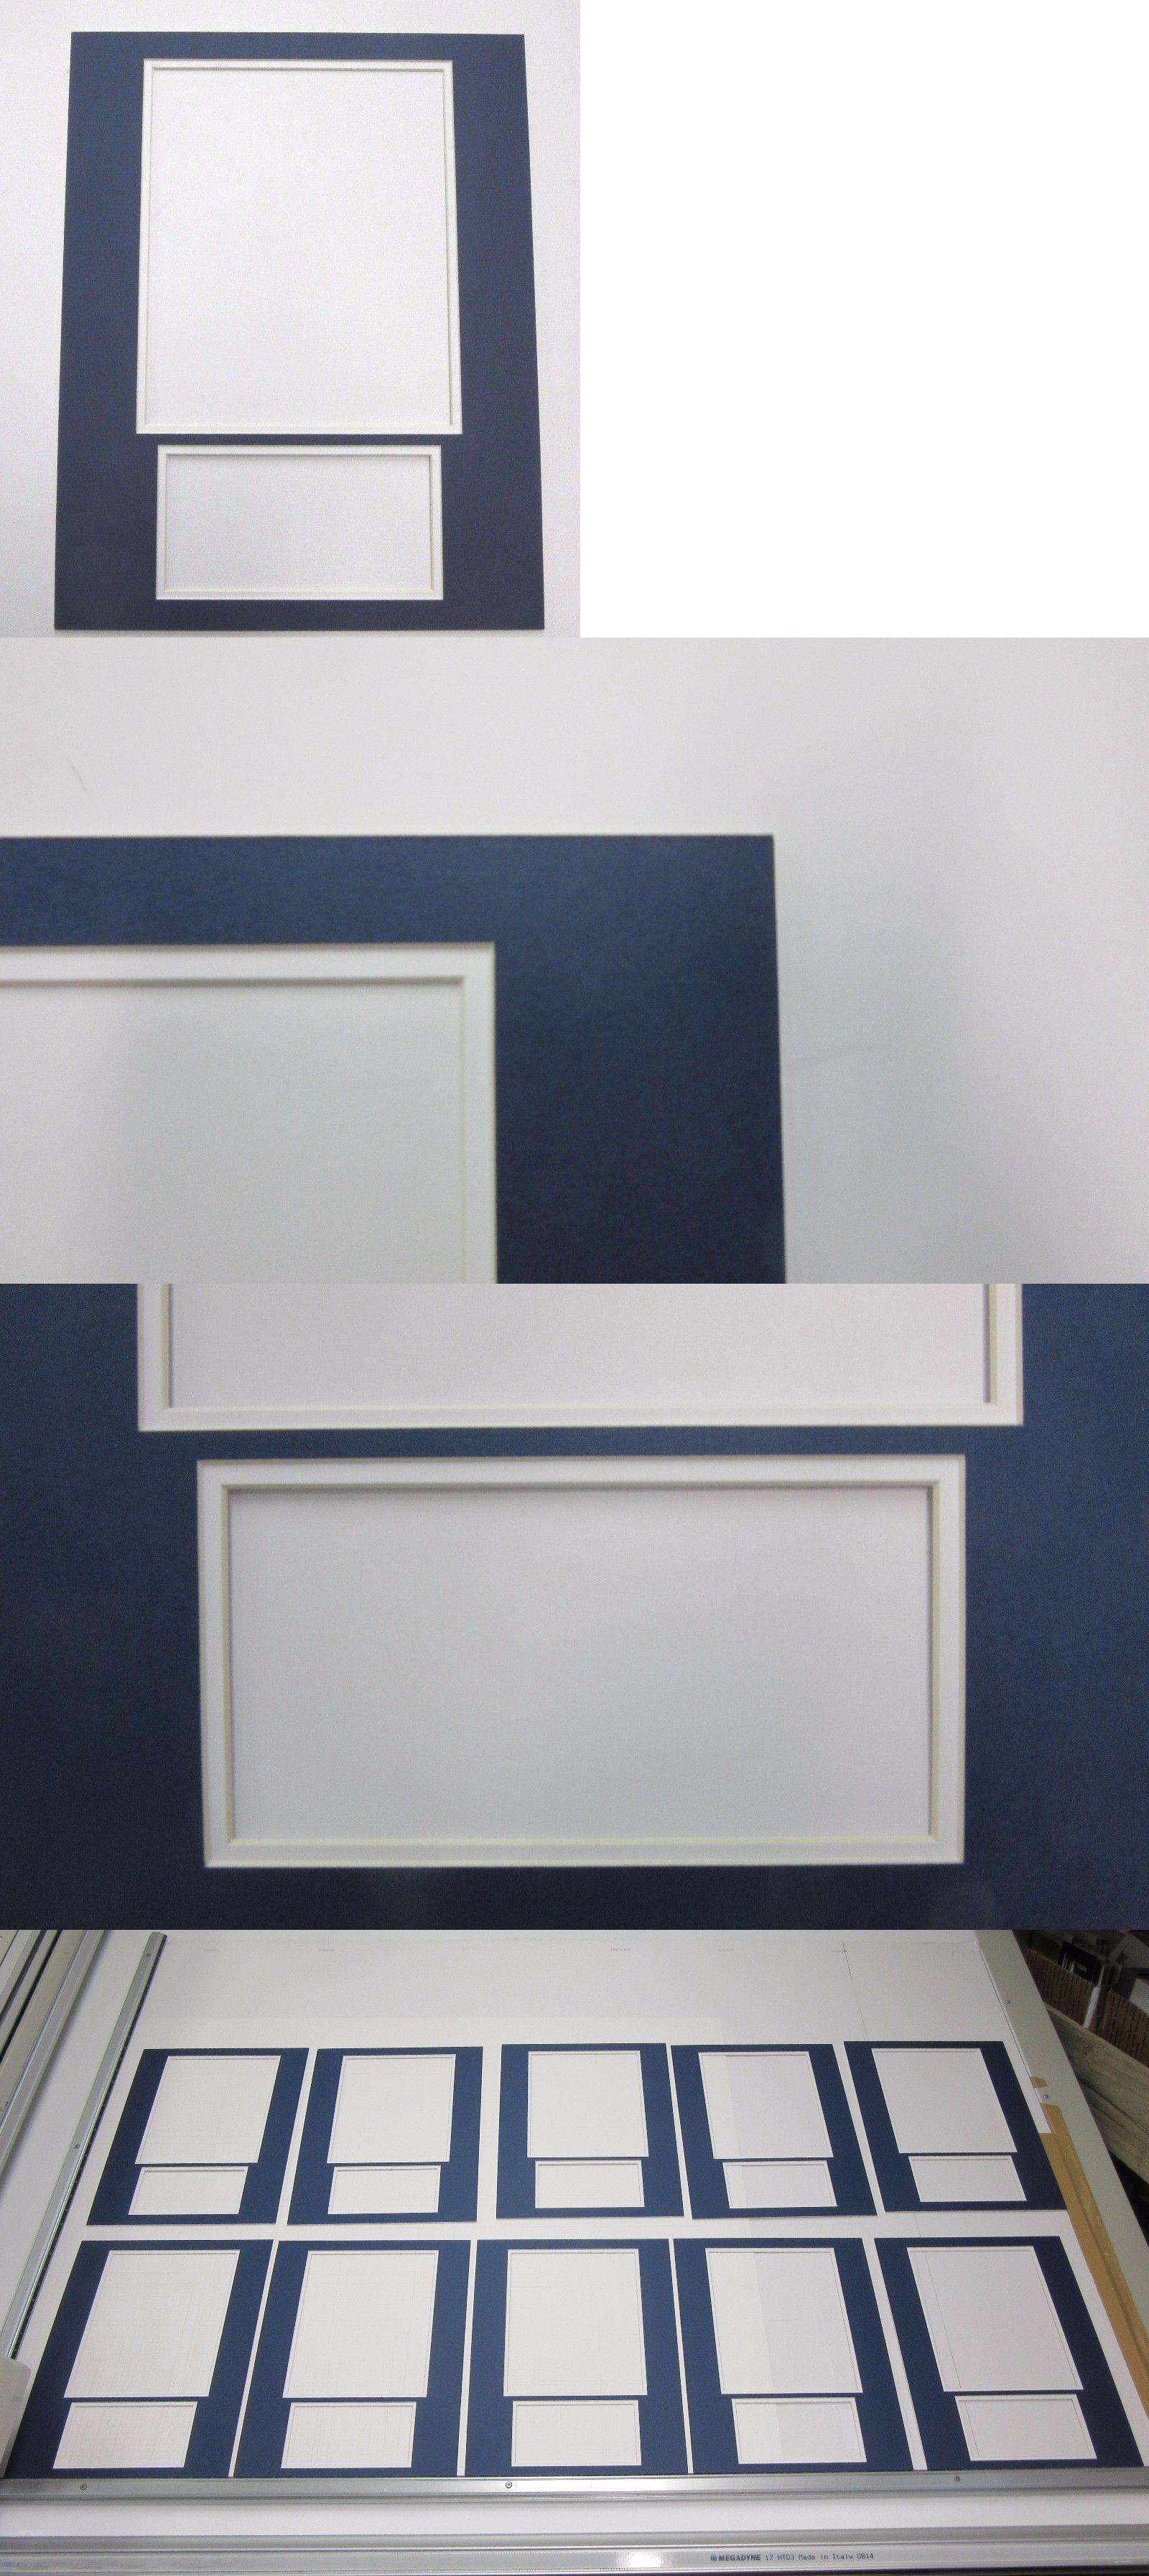 Framing Mats 37576: Picture Framing Mat 11X14 Custom Openings Yale ...